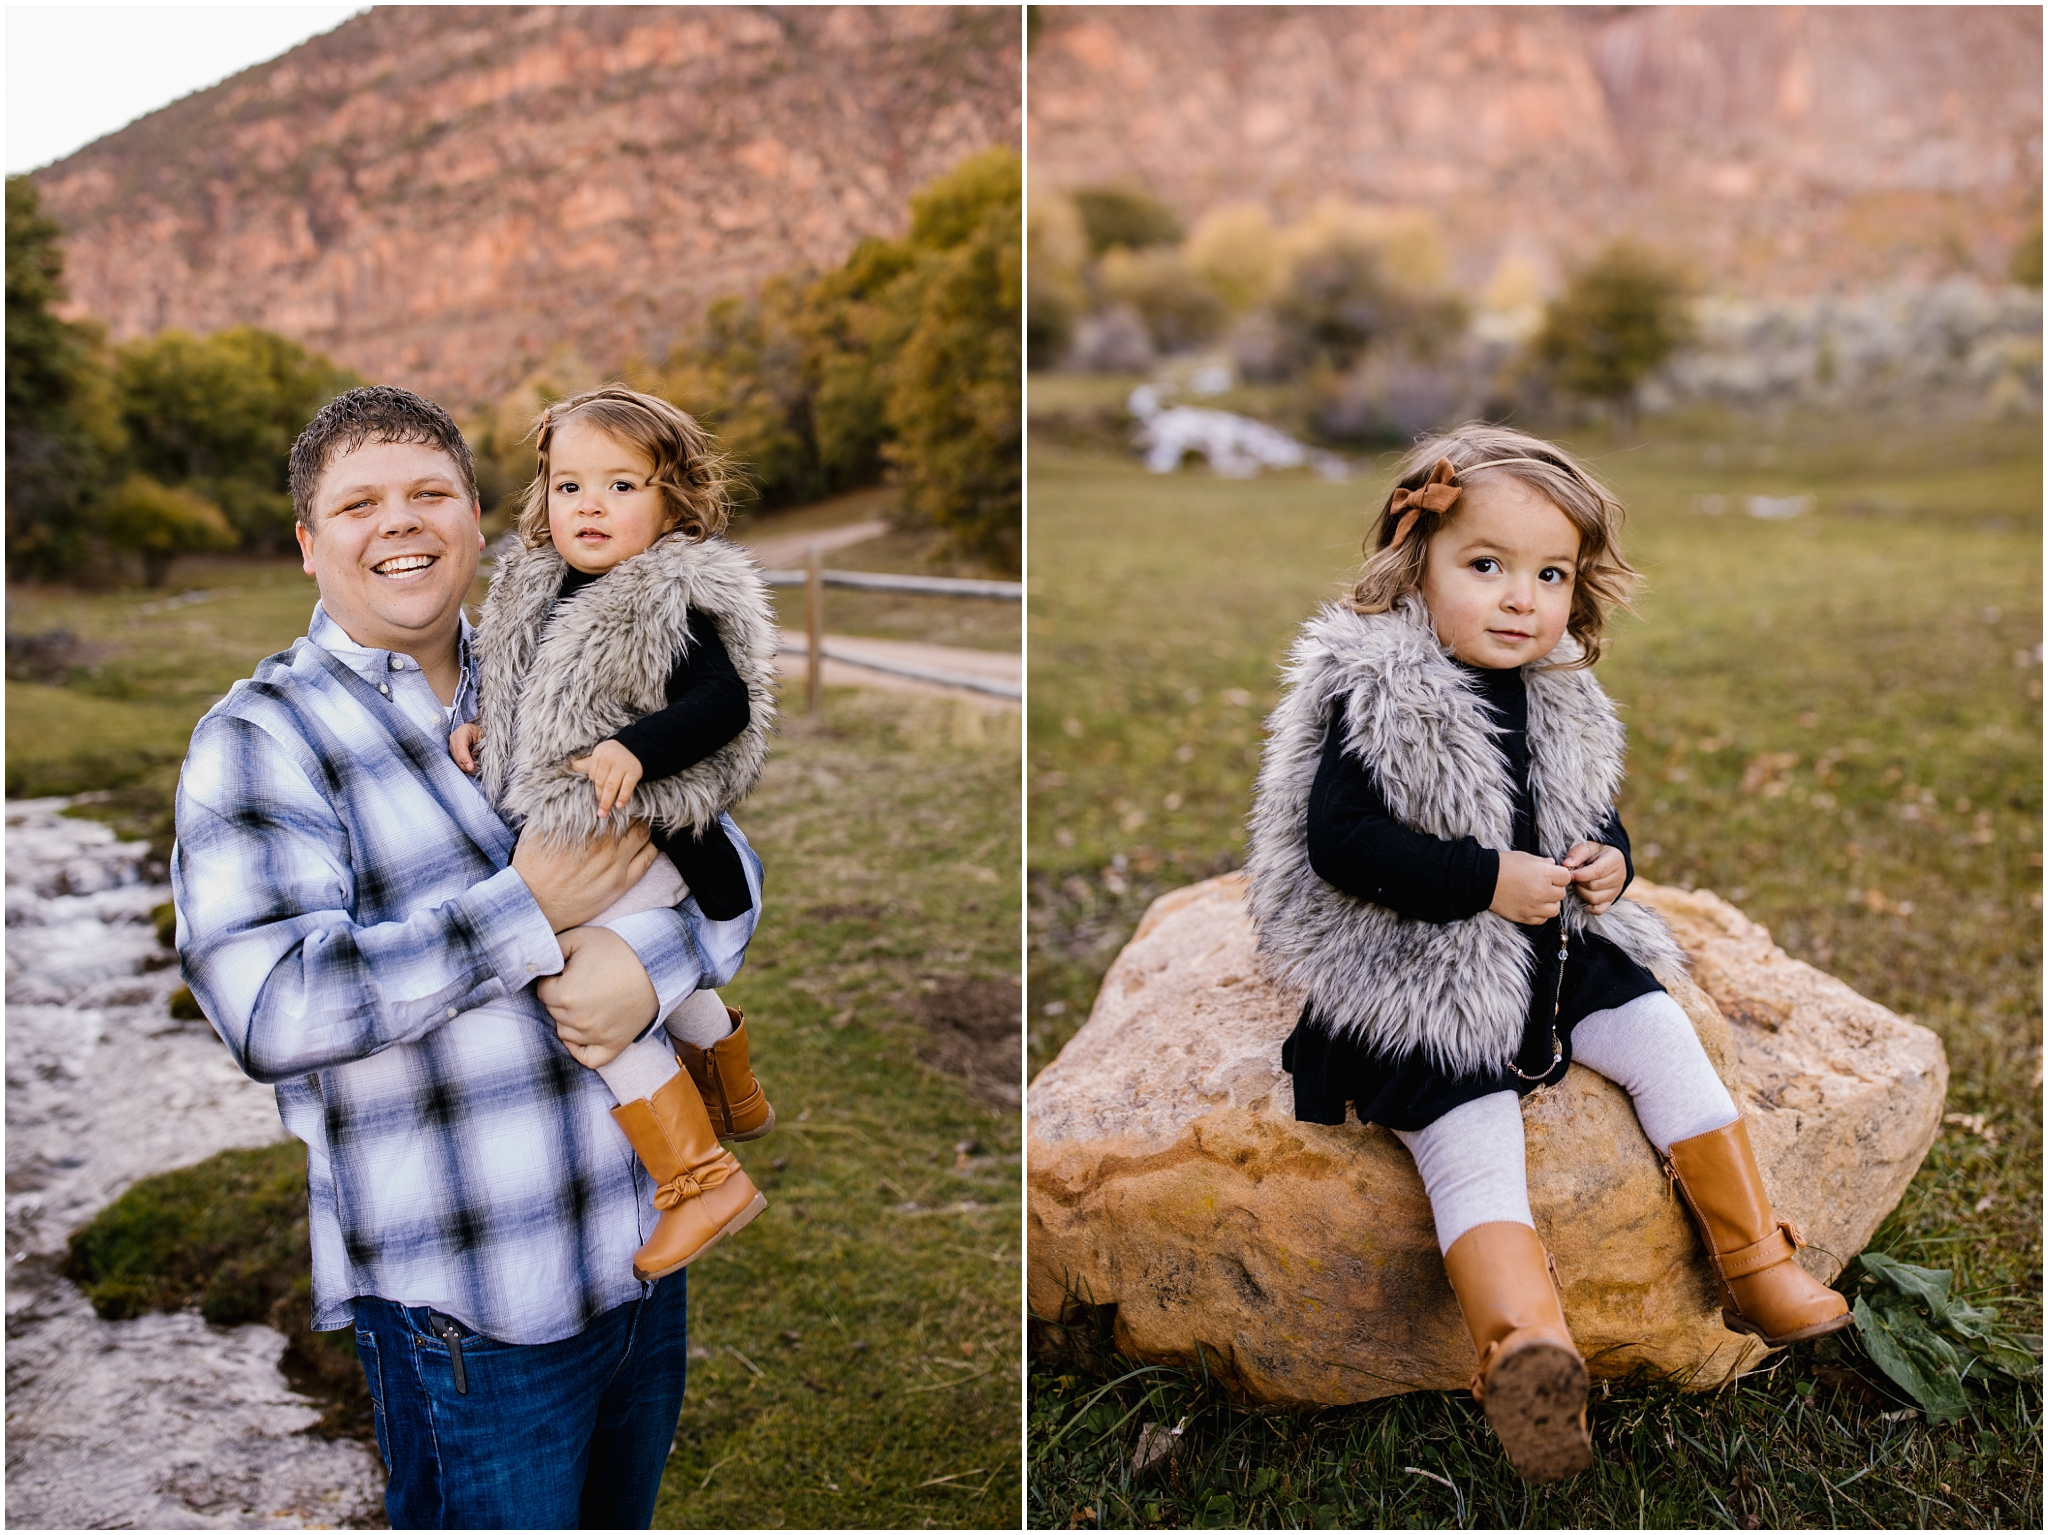 Frandsen-65_Lizzie-B-Imagery-Utah-Family-Photographer-Utah-County-Central-Utah-Park-City-Salt-Lake-City.jpg